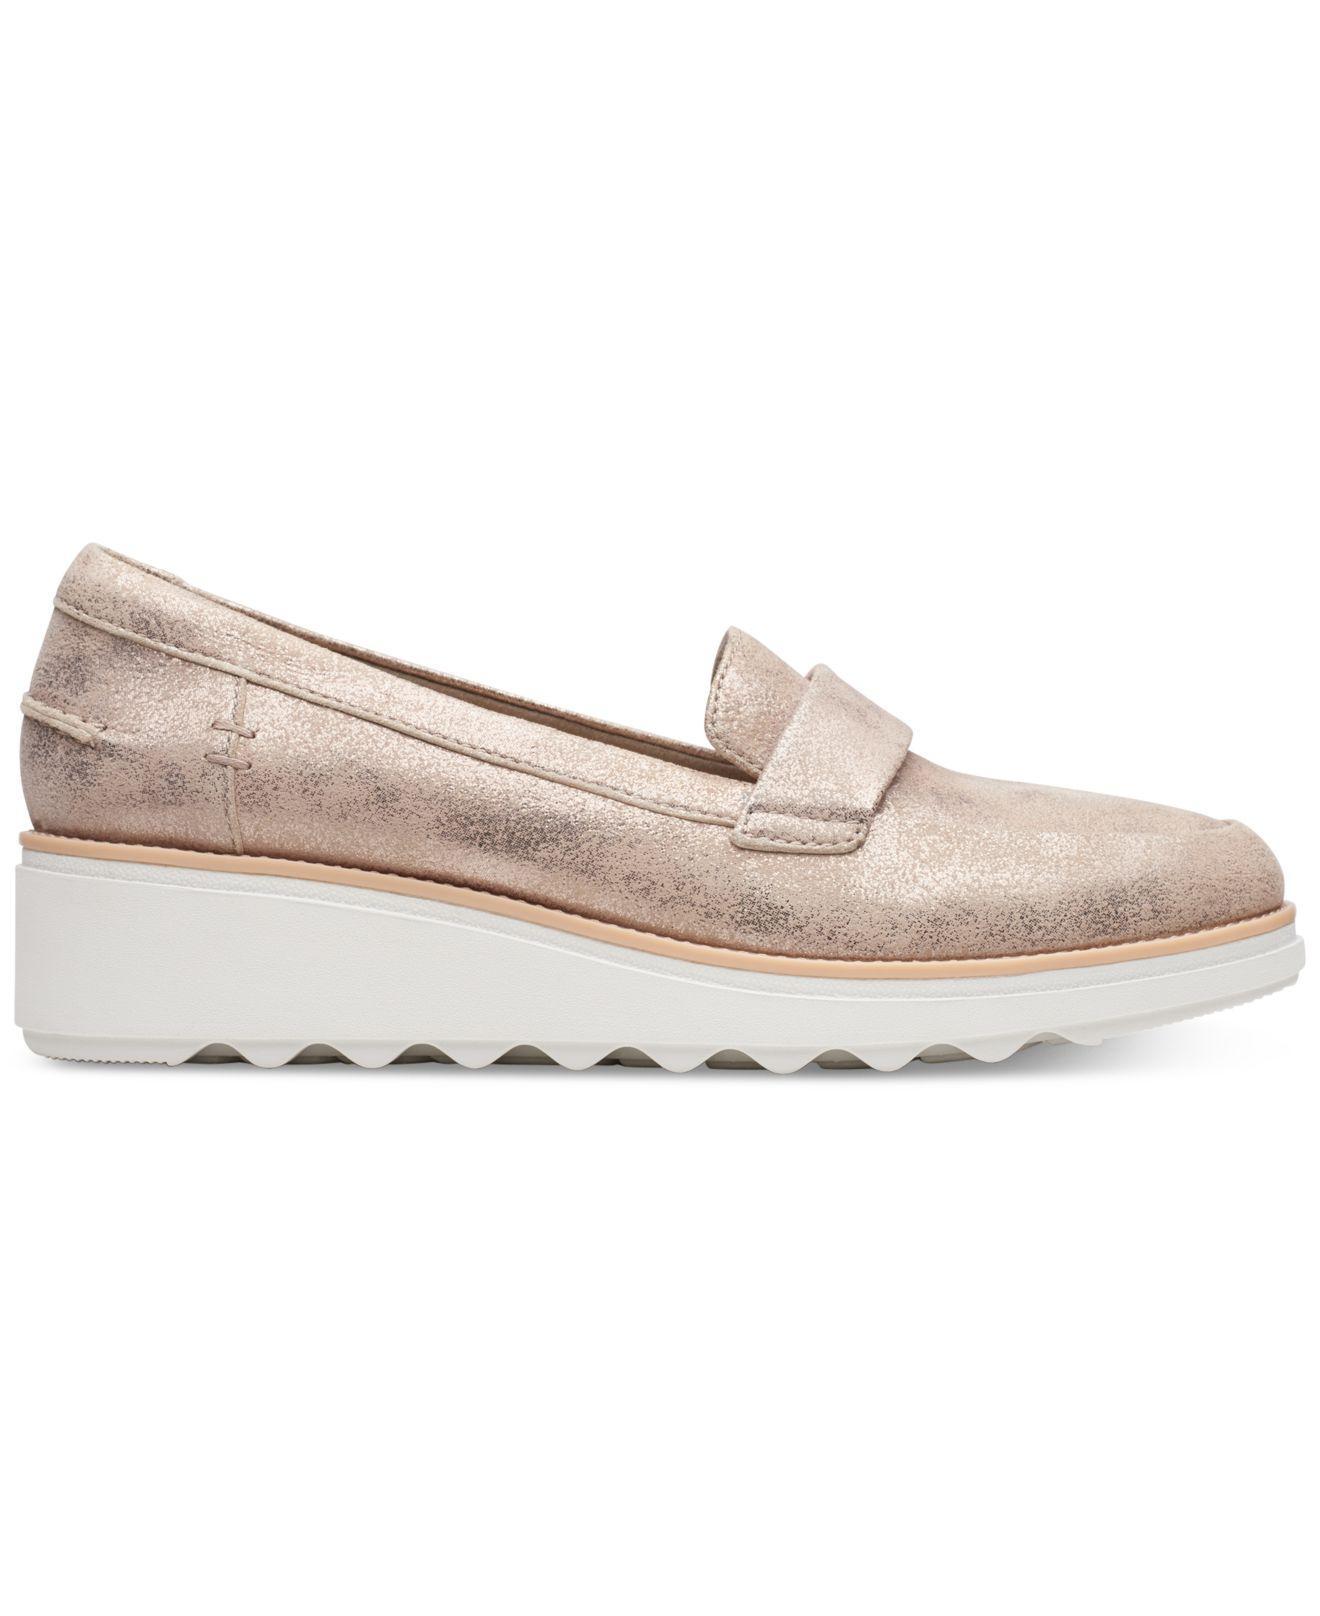 e47809ee34fe Lyst - Clarks Sharon Gracie Platform Loafers